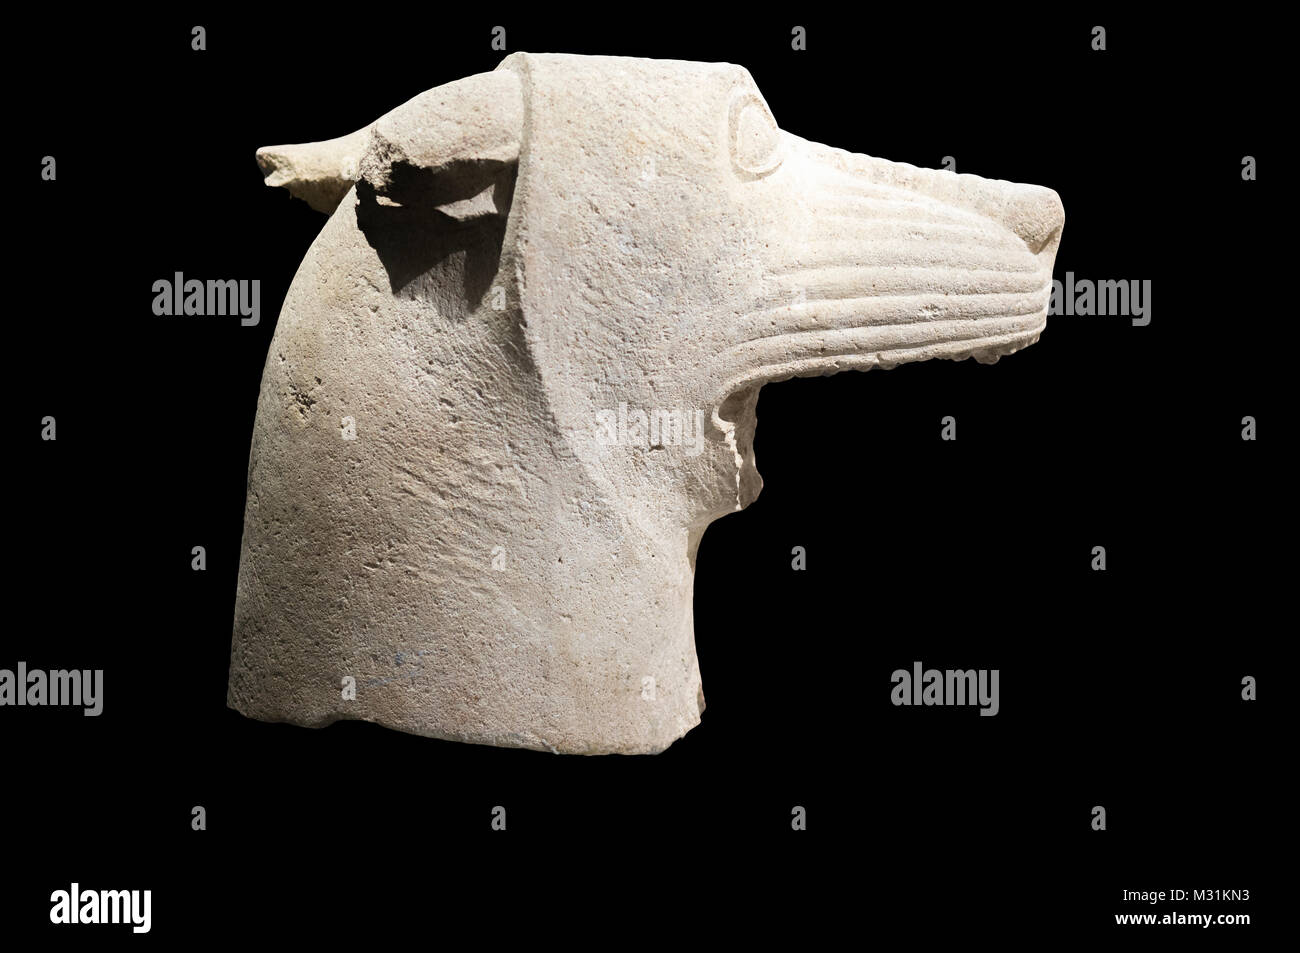 Jaen, Spain - December 29th, 2017: Wolf's head of Heroic Shrine of El Pajarillo, Huelma, Jaen at Iberian Museum - Stock Image